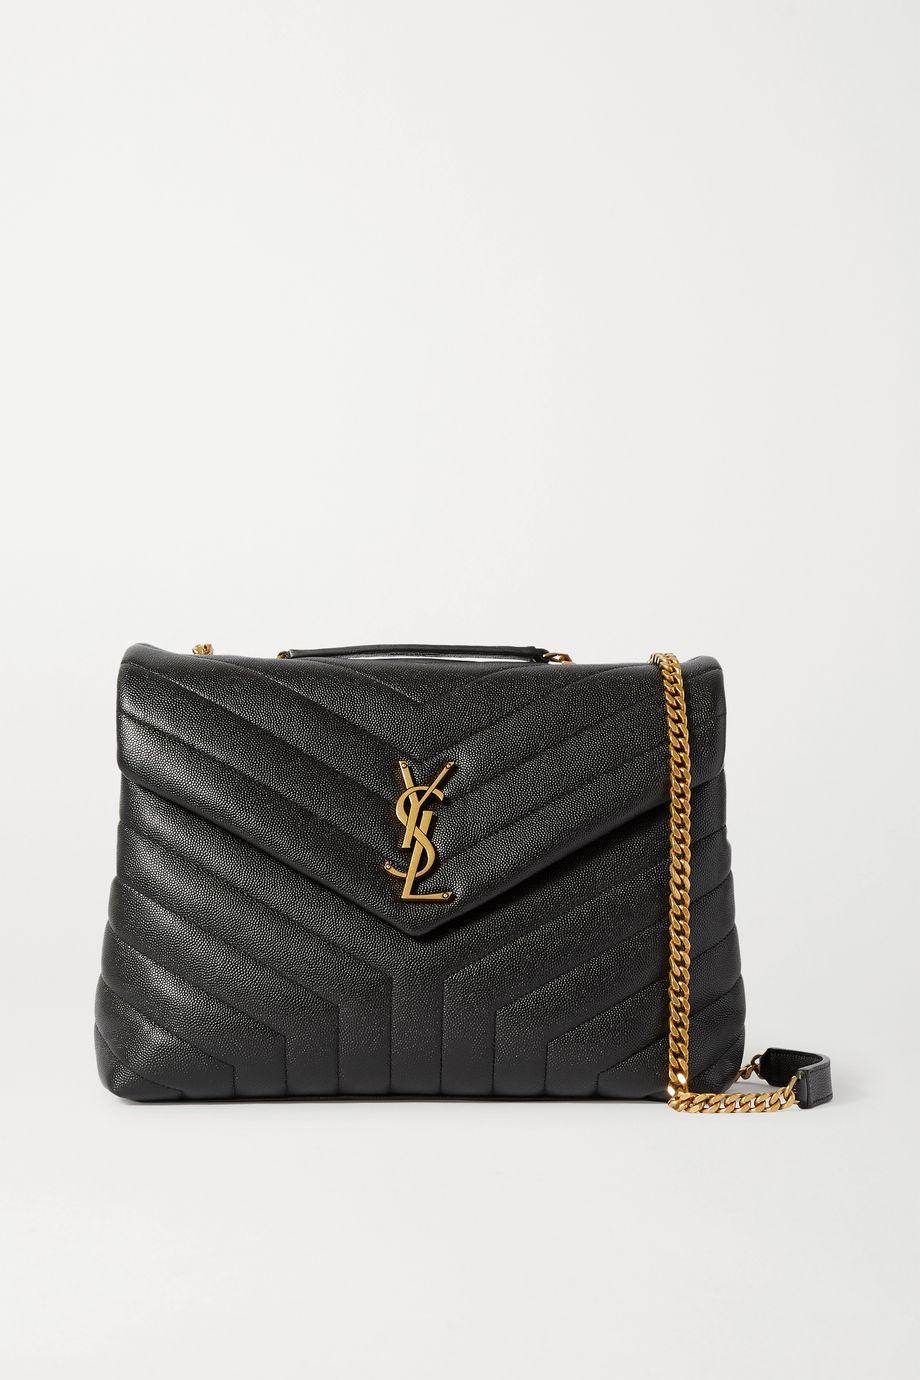 SAINT LAURENT Loulou medium quilted textured-leather shoulder bag